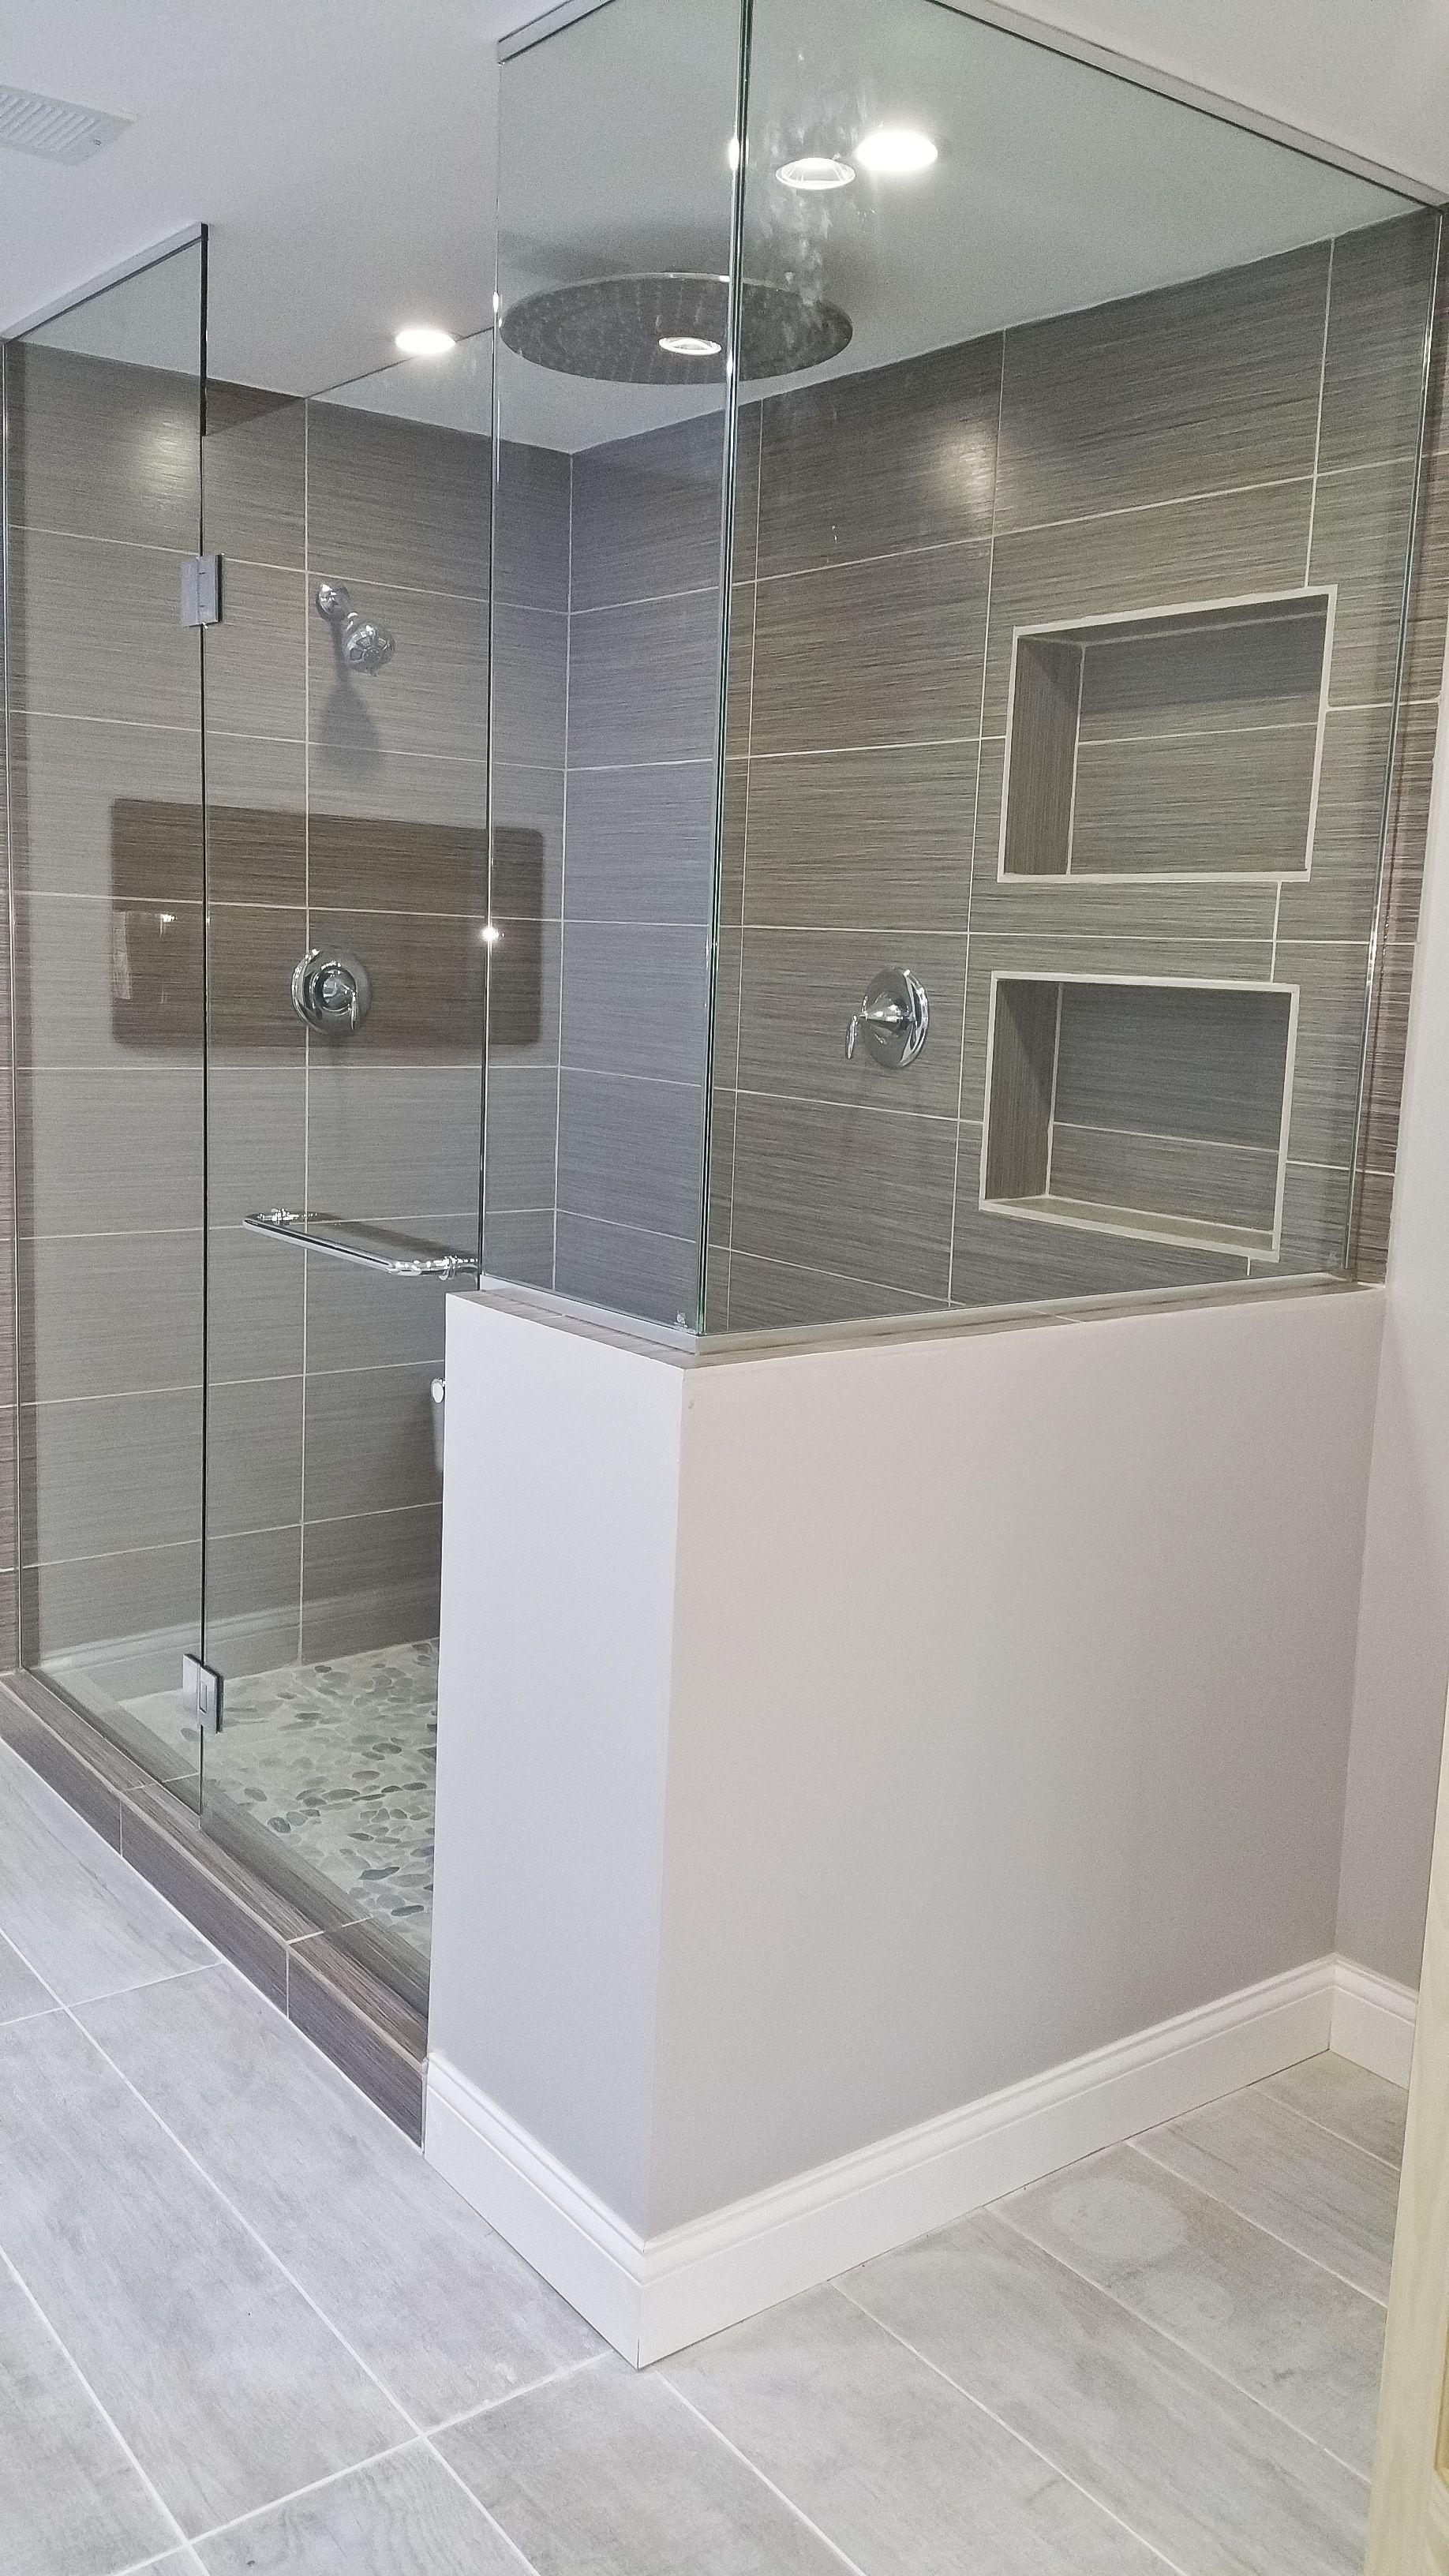 19 Fresh Shower Tile Ideas And Designs For 2019 Bathroom